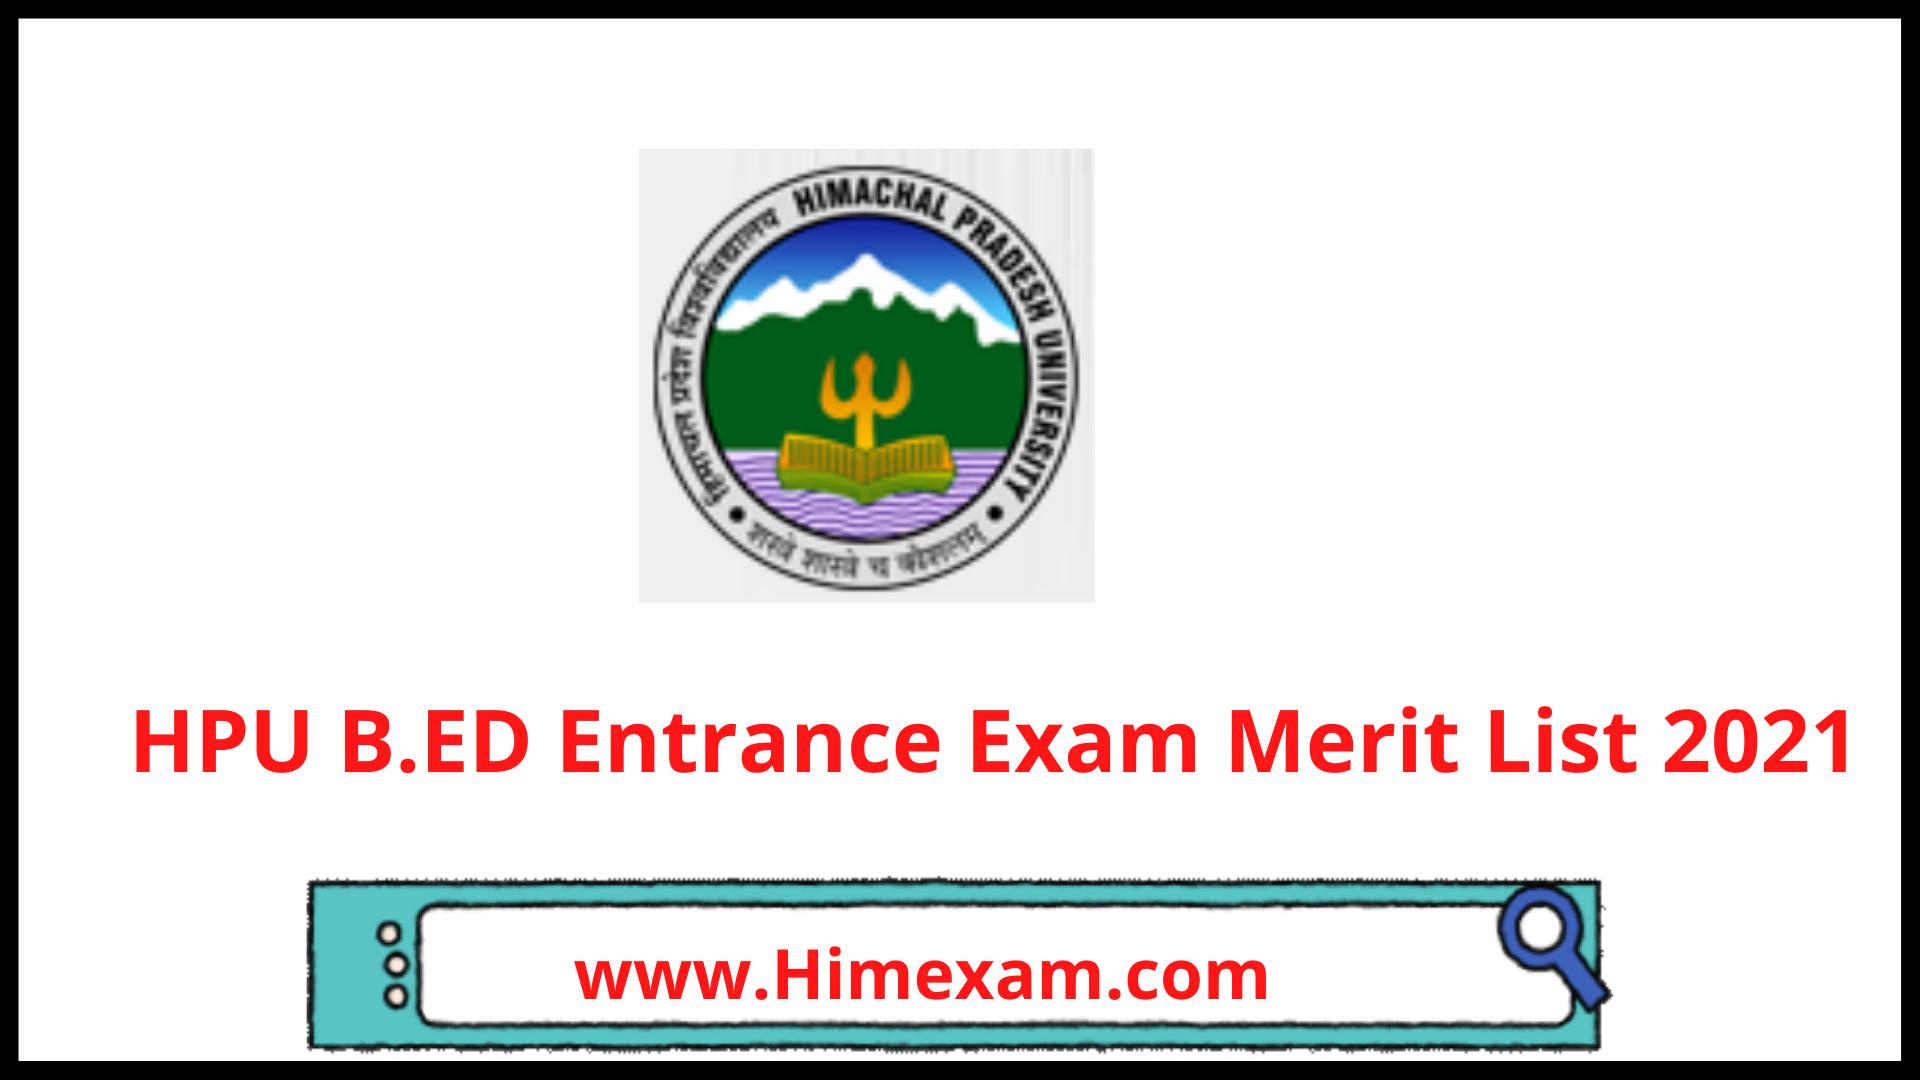 HPU B.ED Entrance Exam Merit List 2021